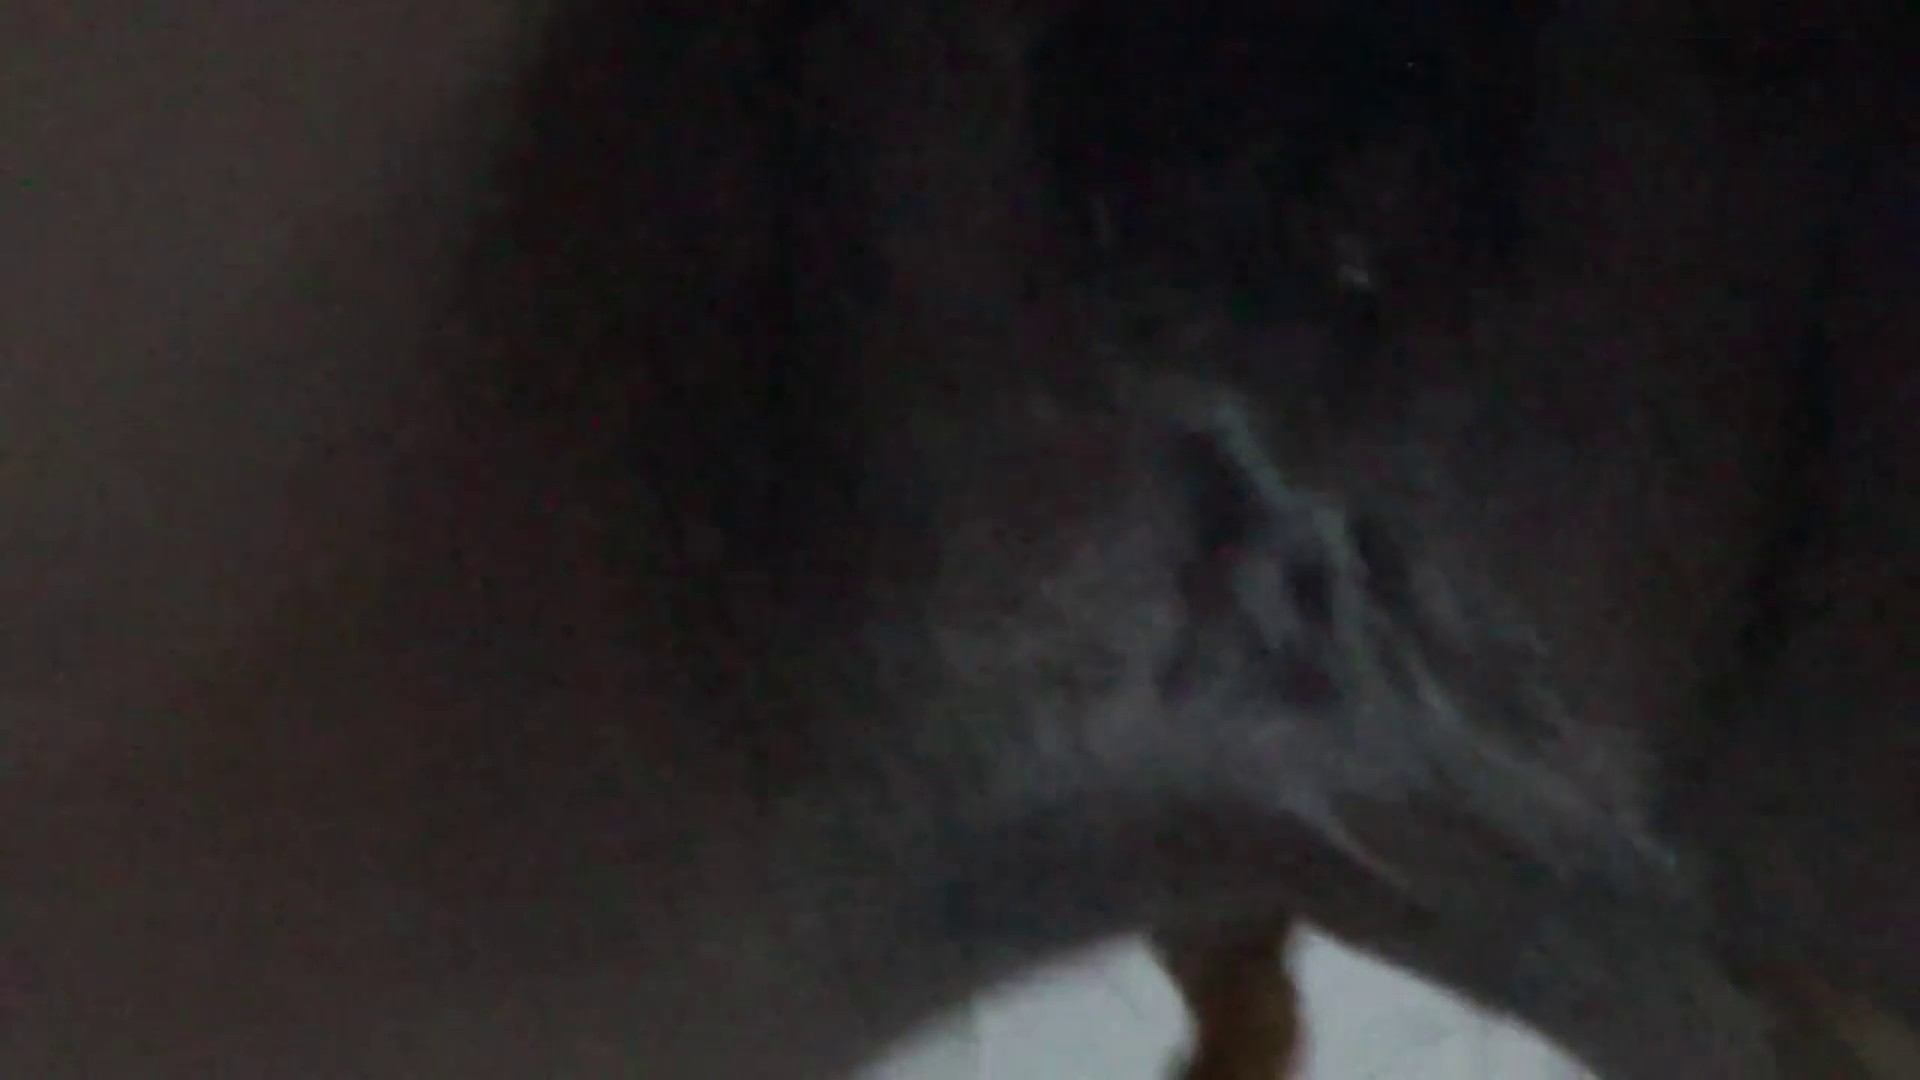 JD盗撮 美女の洗面所の秘密 Vol.41 盗撮 濡れ場動画紹介 71PIX 22